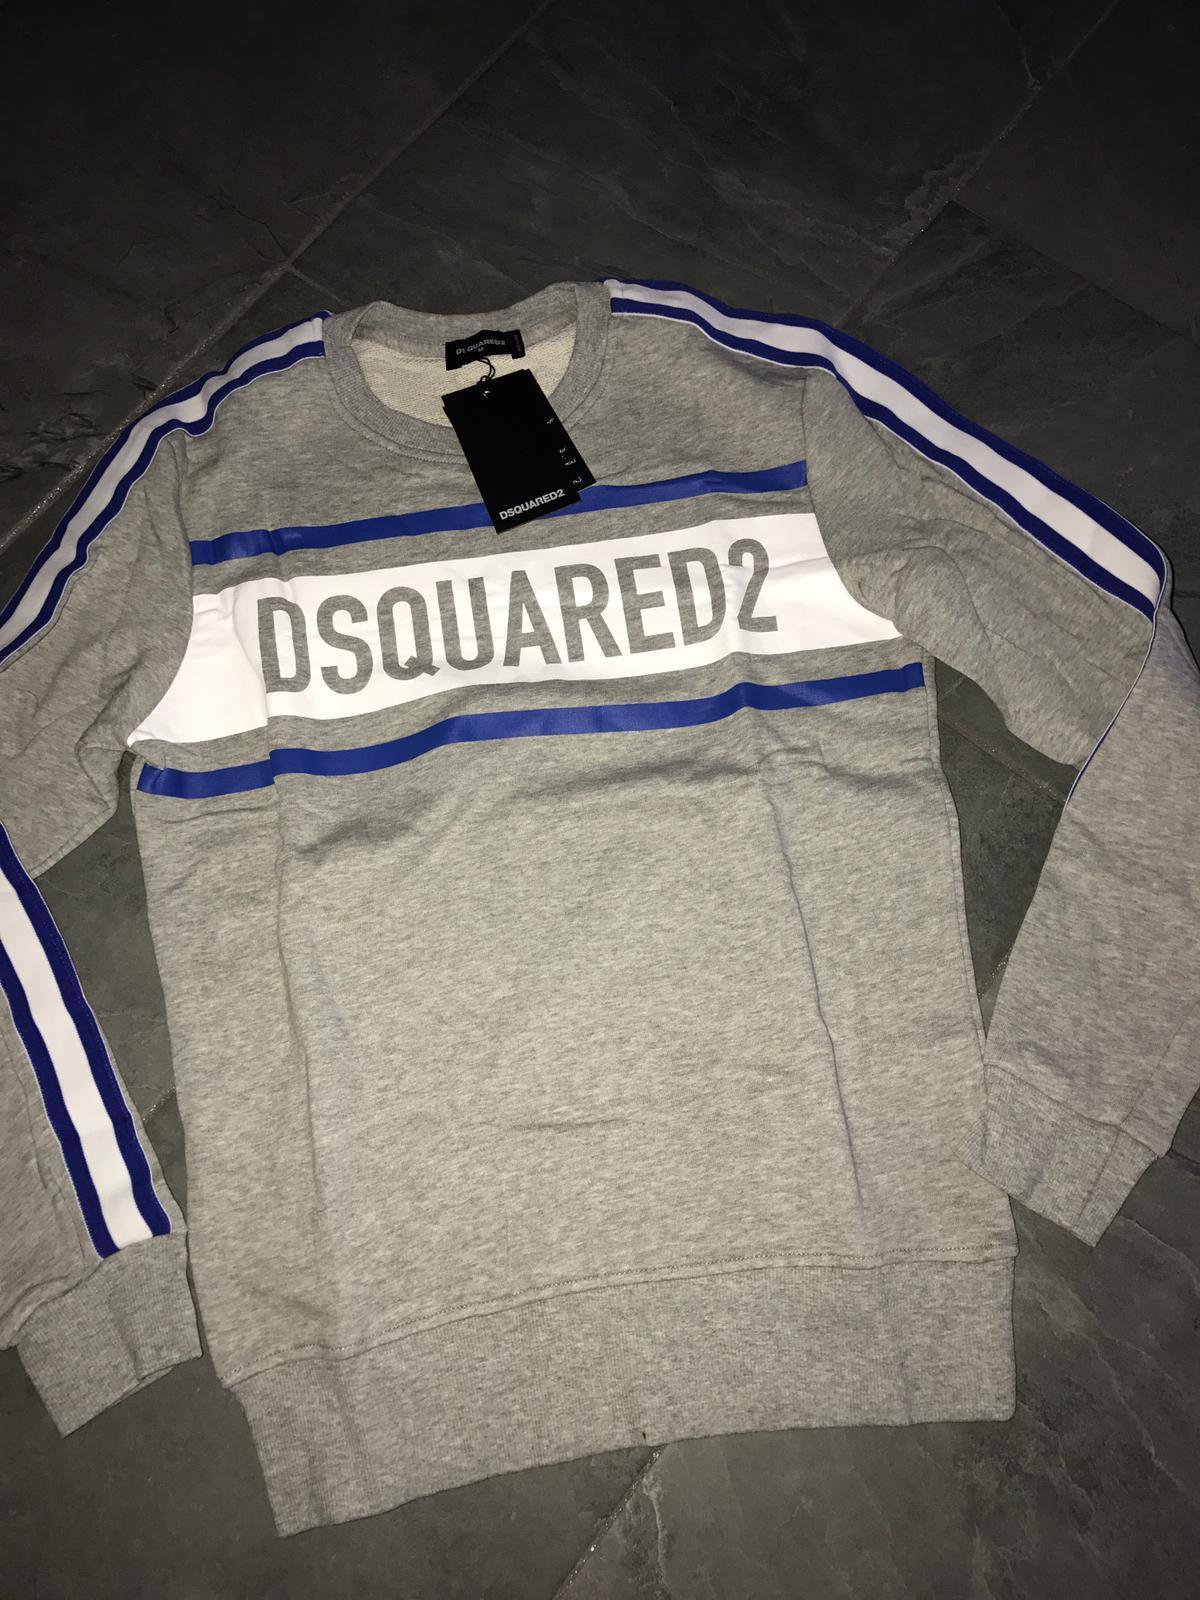 Dsquared  X-Large Grey Sweatshirt with Stripes on Shoulder Slim Fit (UK Large).